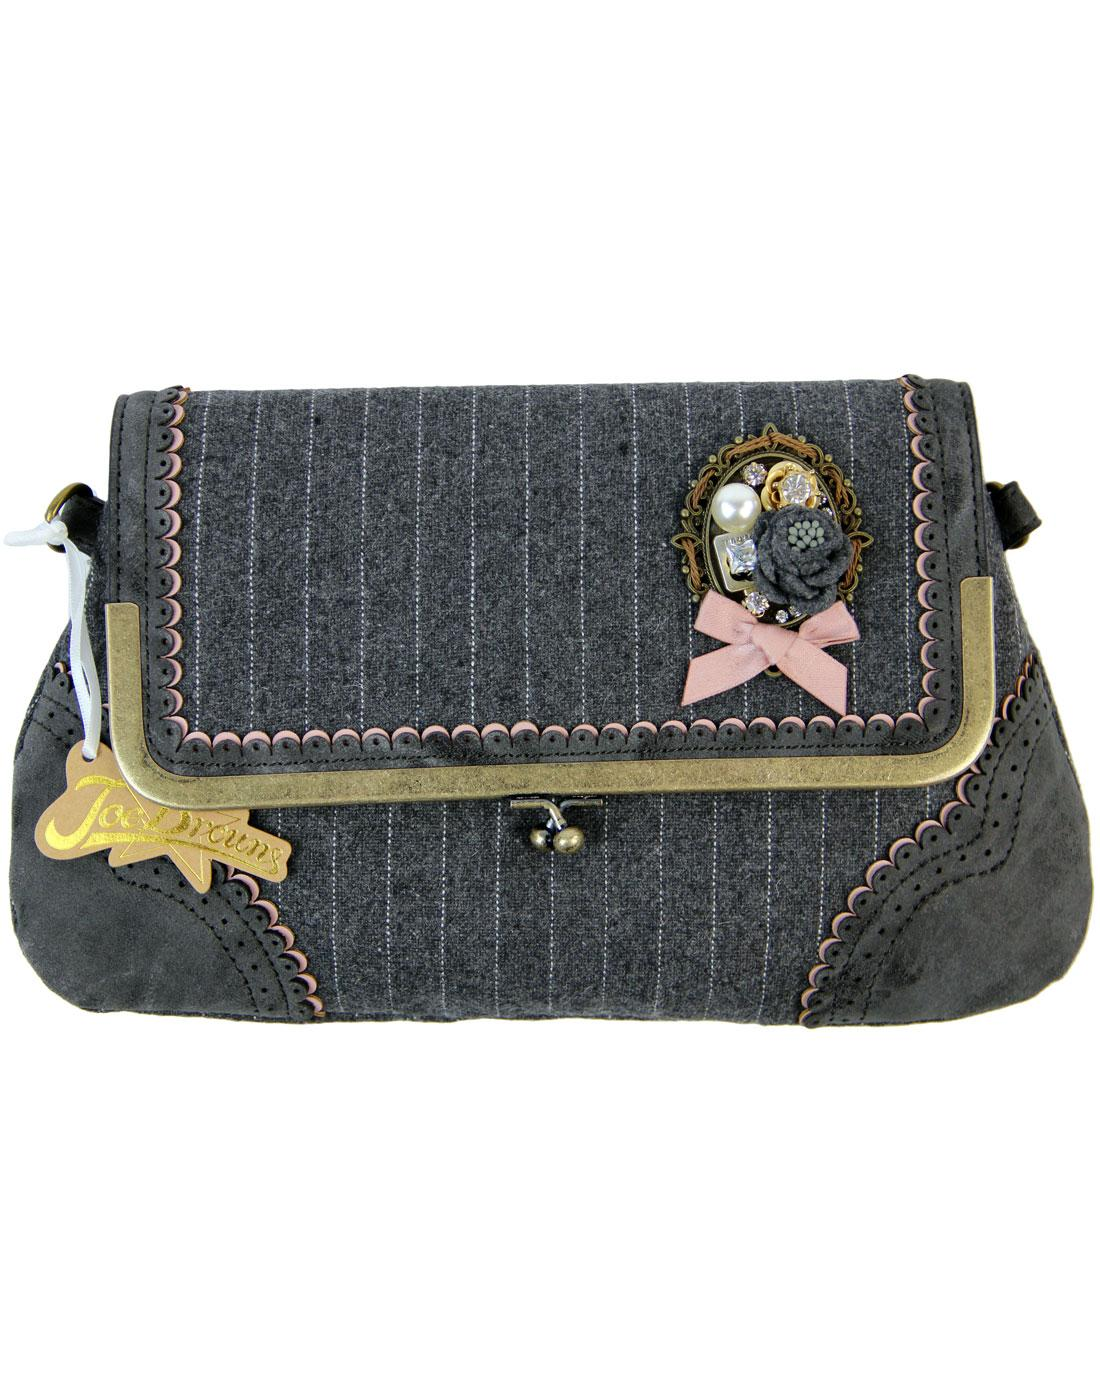 Ambrose Bag JOE BROWNS Vintage Style Handbag